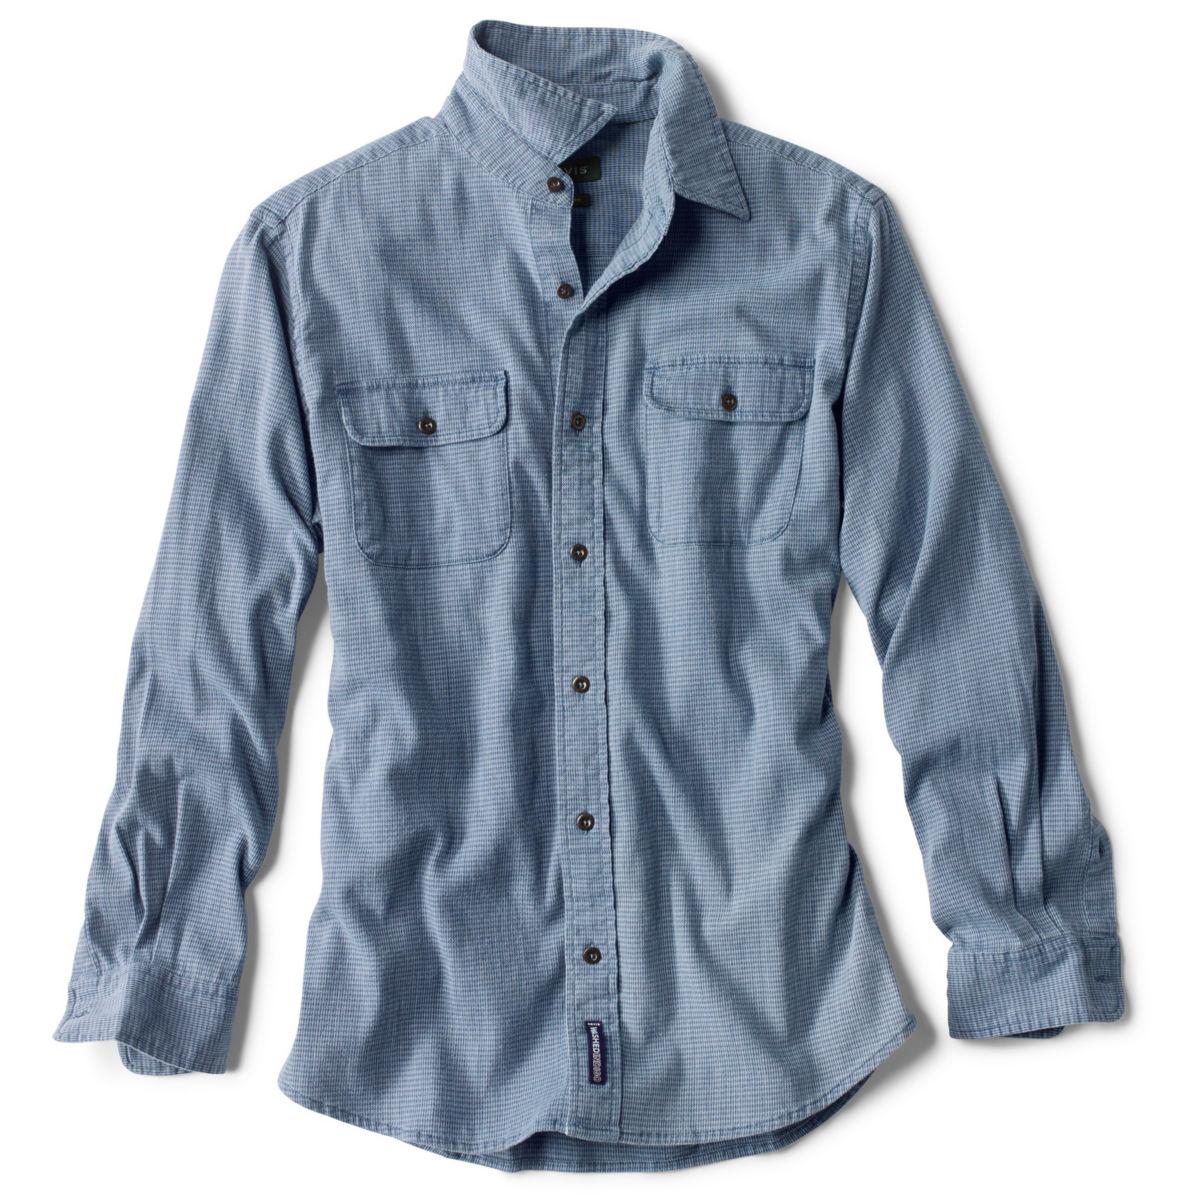 Indigo Houndstooth Comfort Shirt - LIGHT INDIGOimage number 0